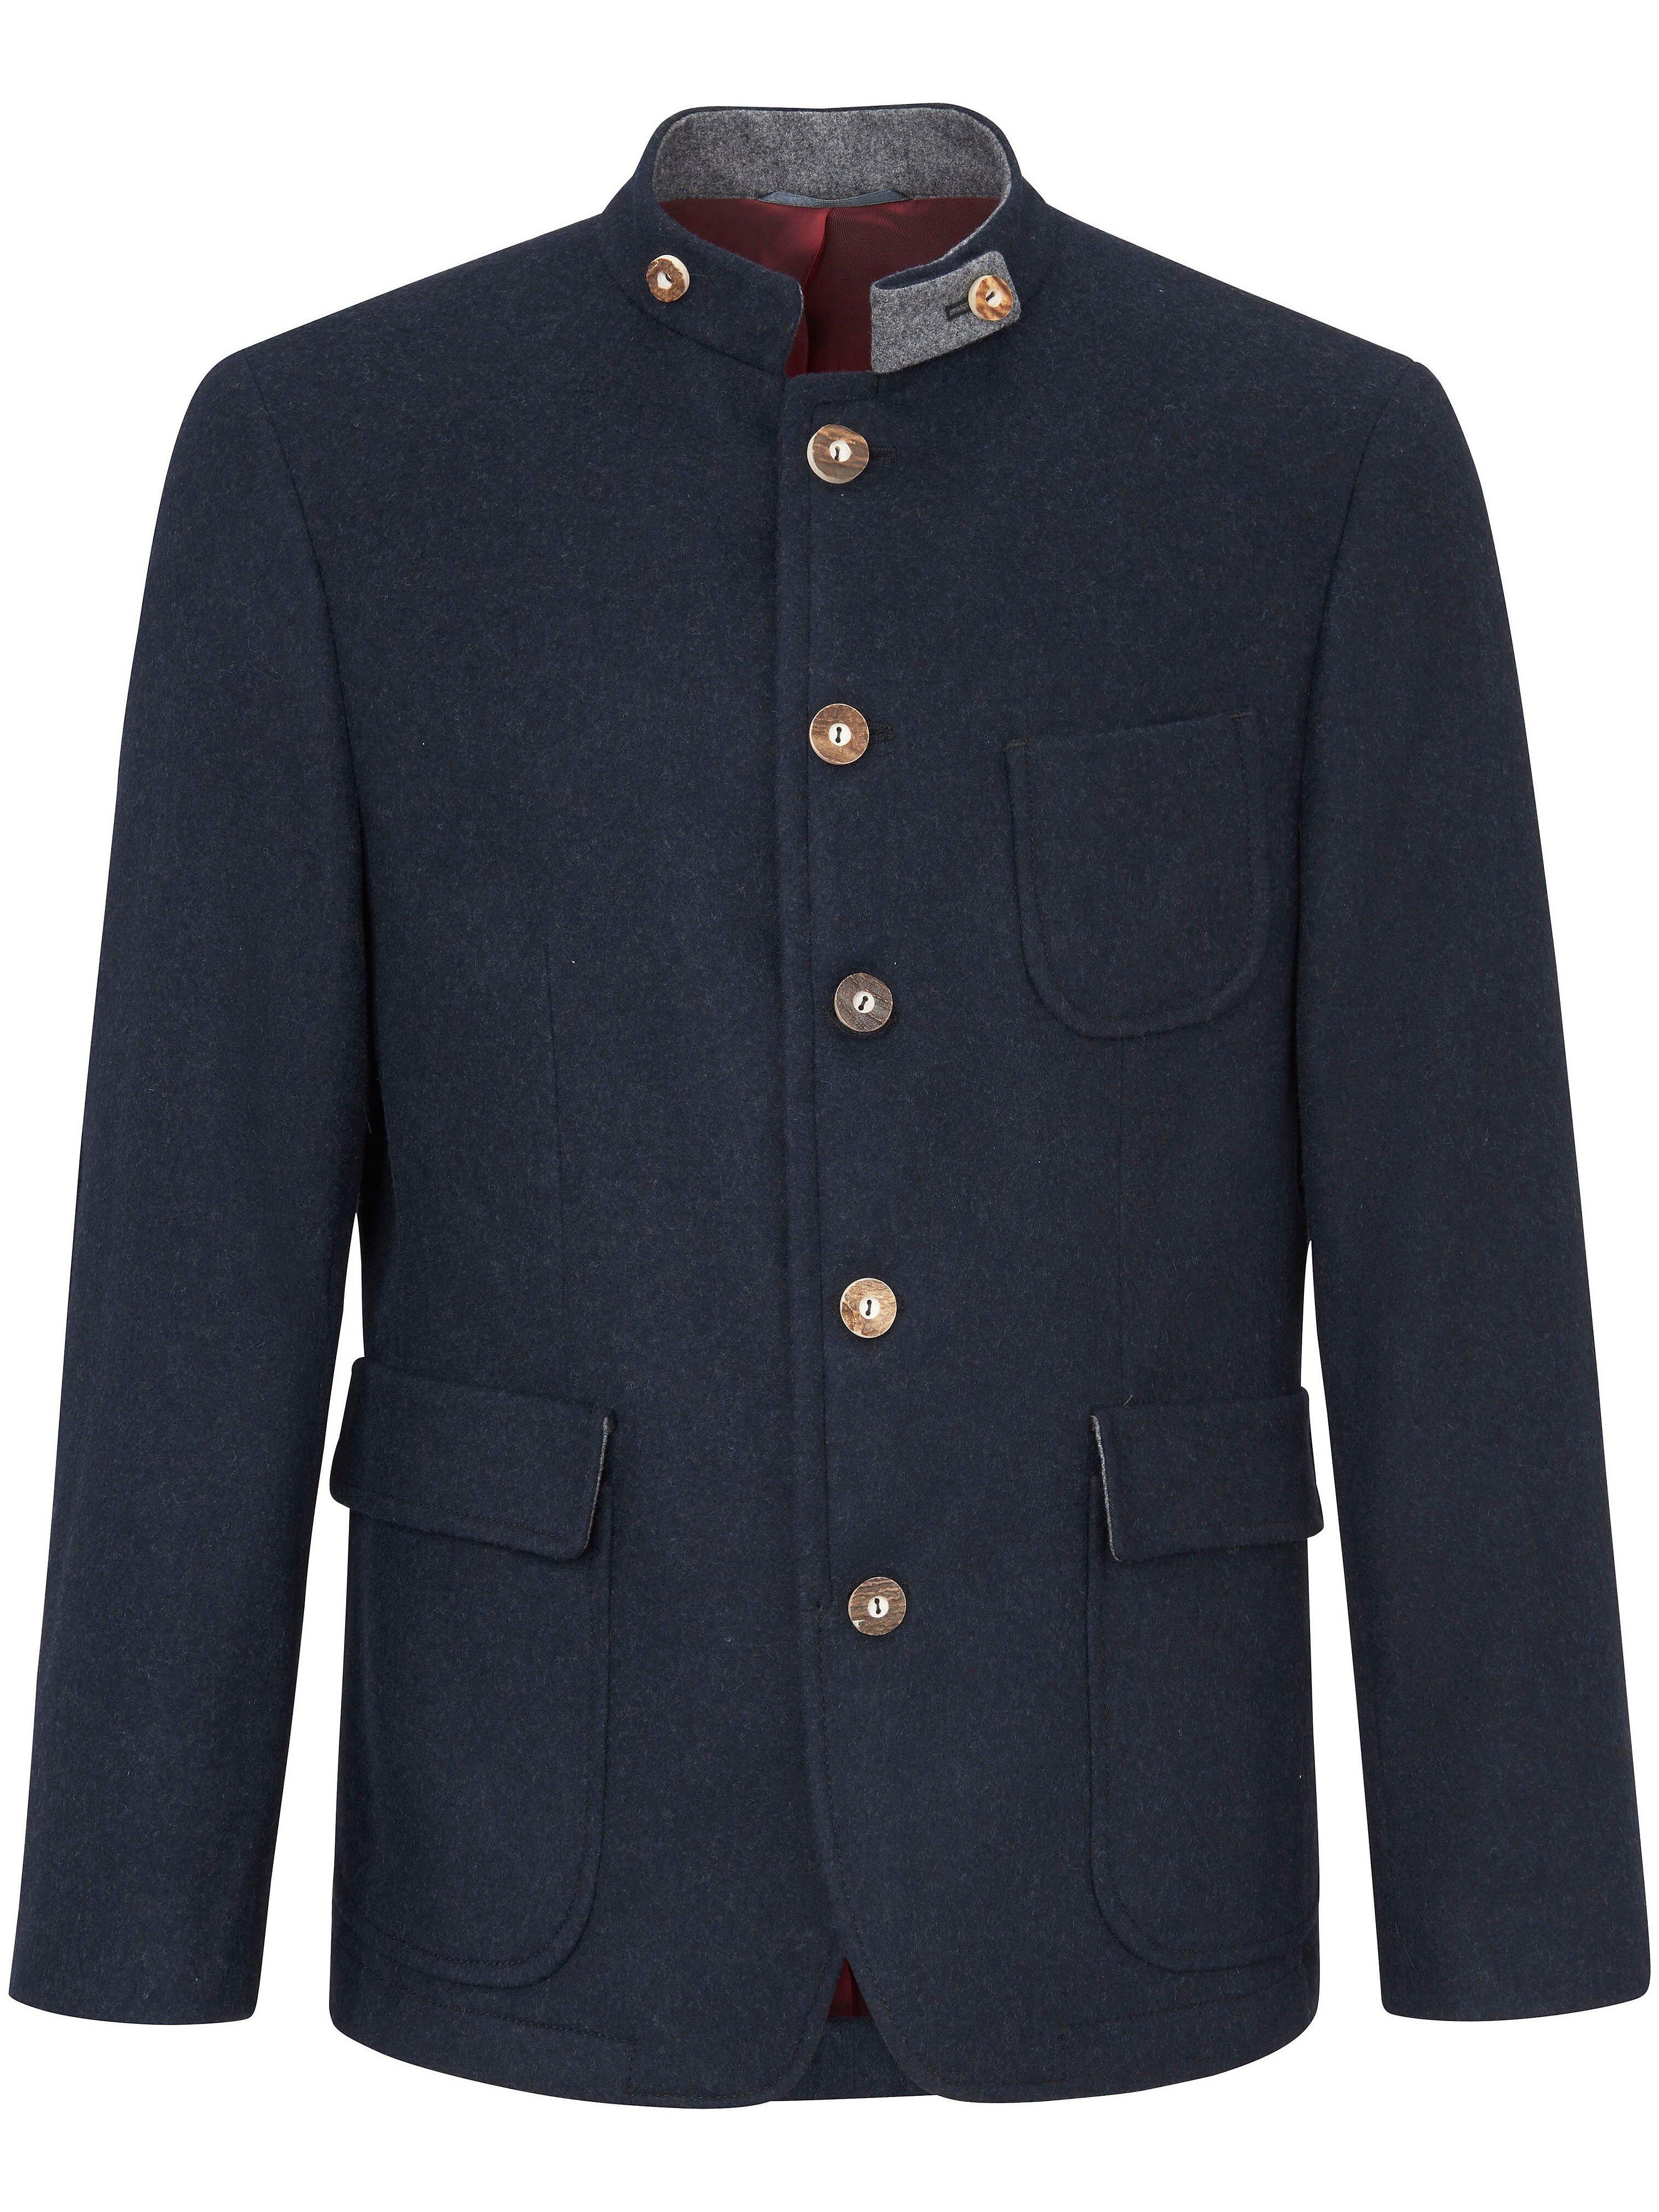 La veste  Lodenfrey bleu taille 52